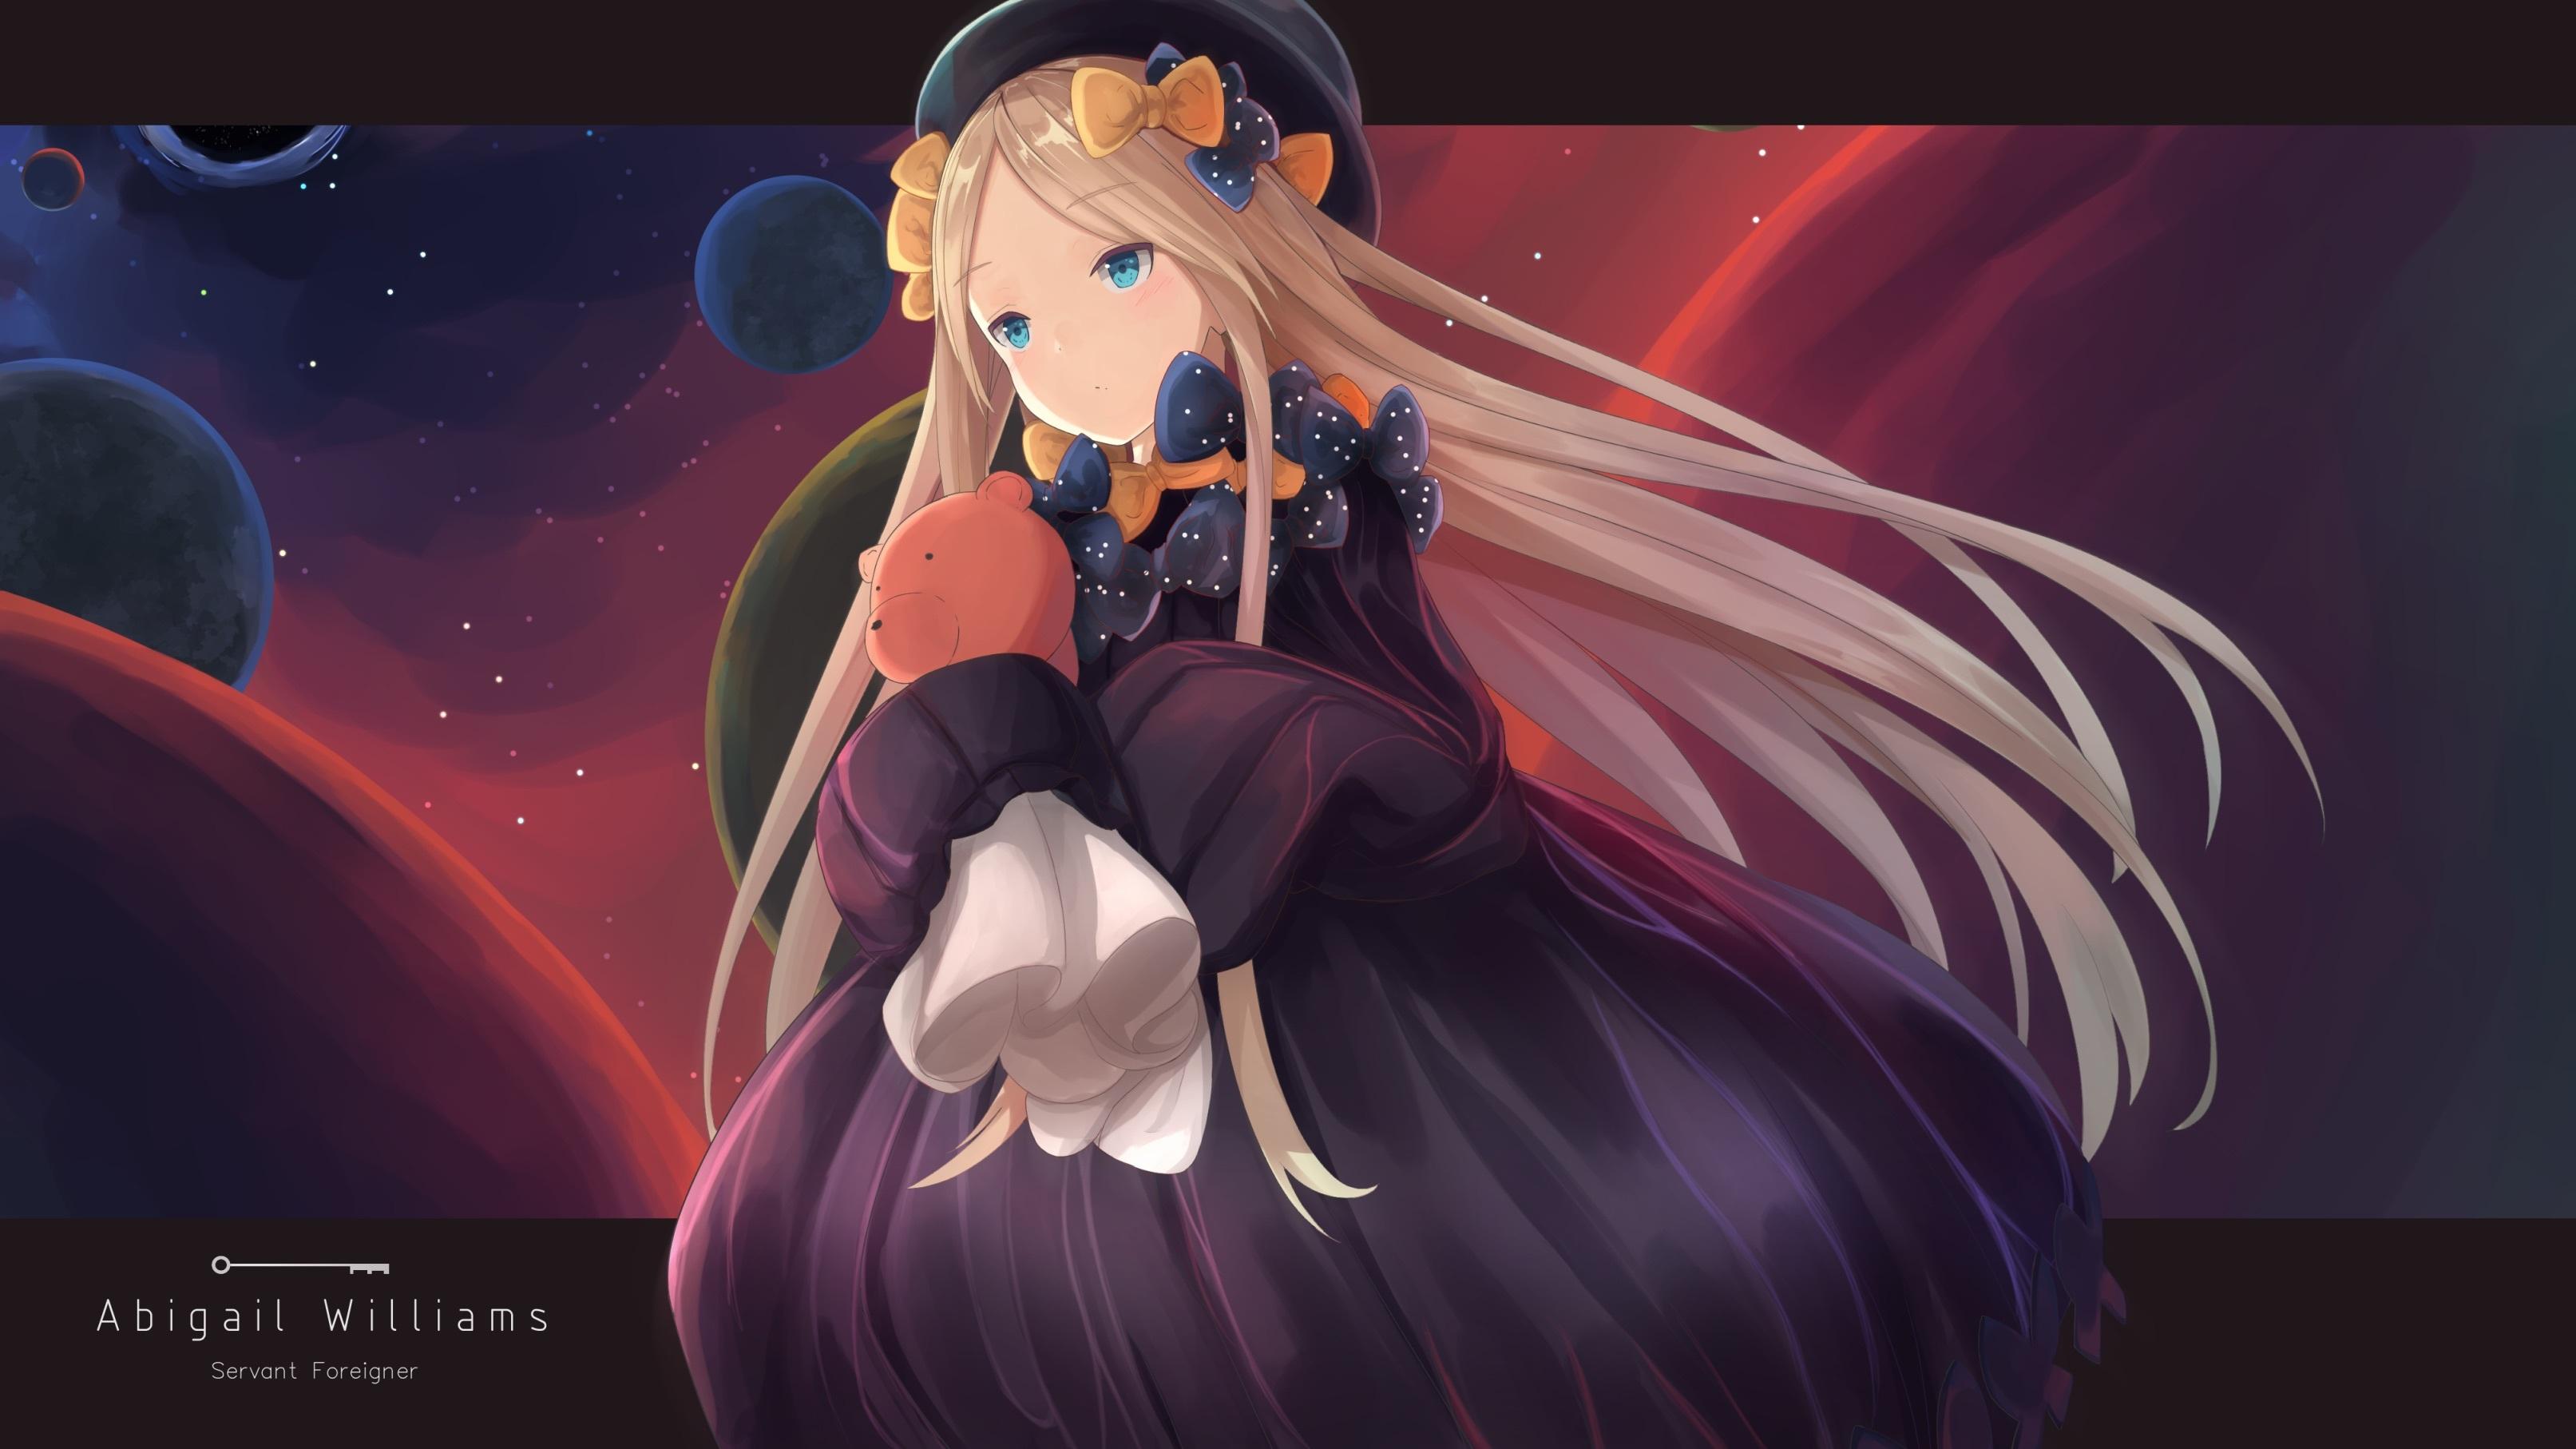 Fate/GrandOrder 異端なるセイレム アビゲイル・ウィリアムズ Abigail Williams No.5131